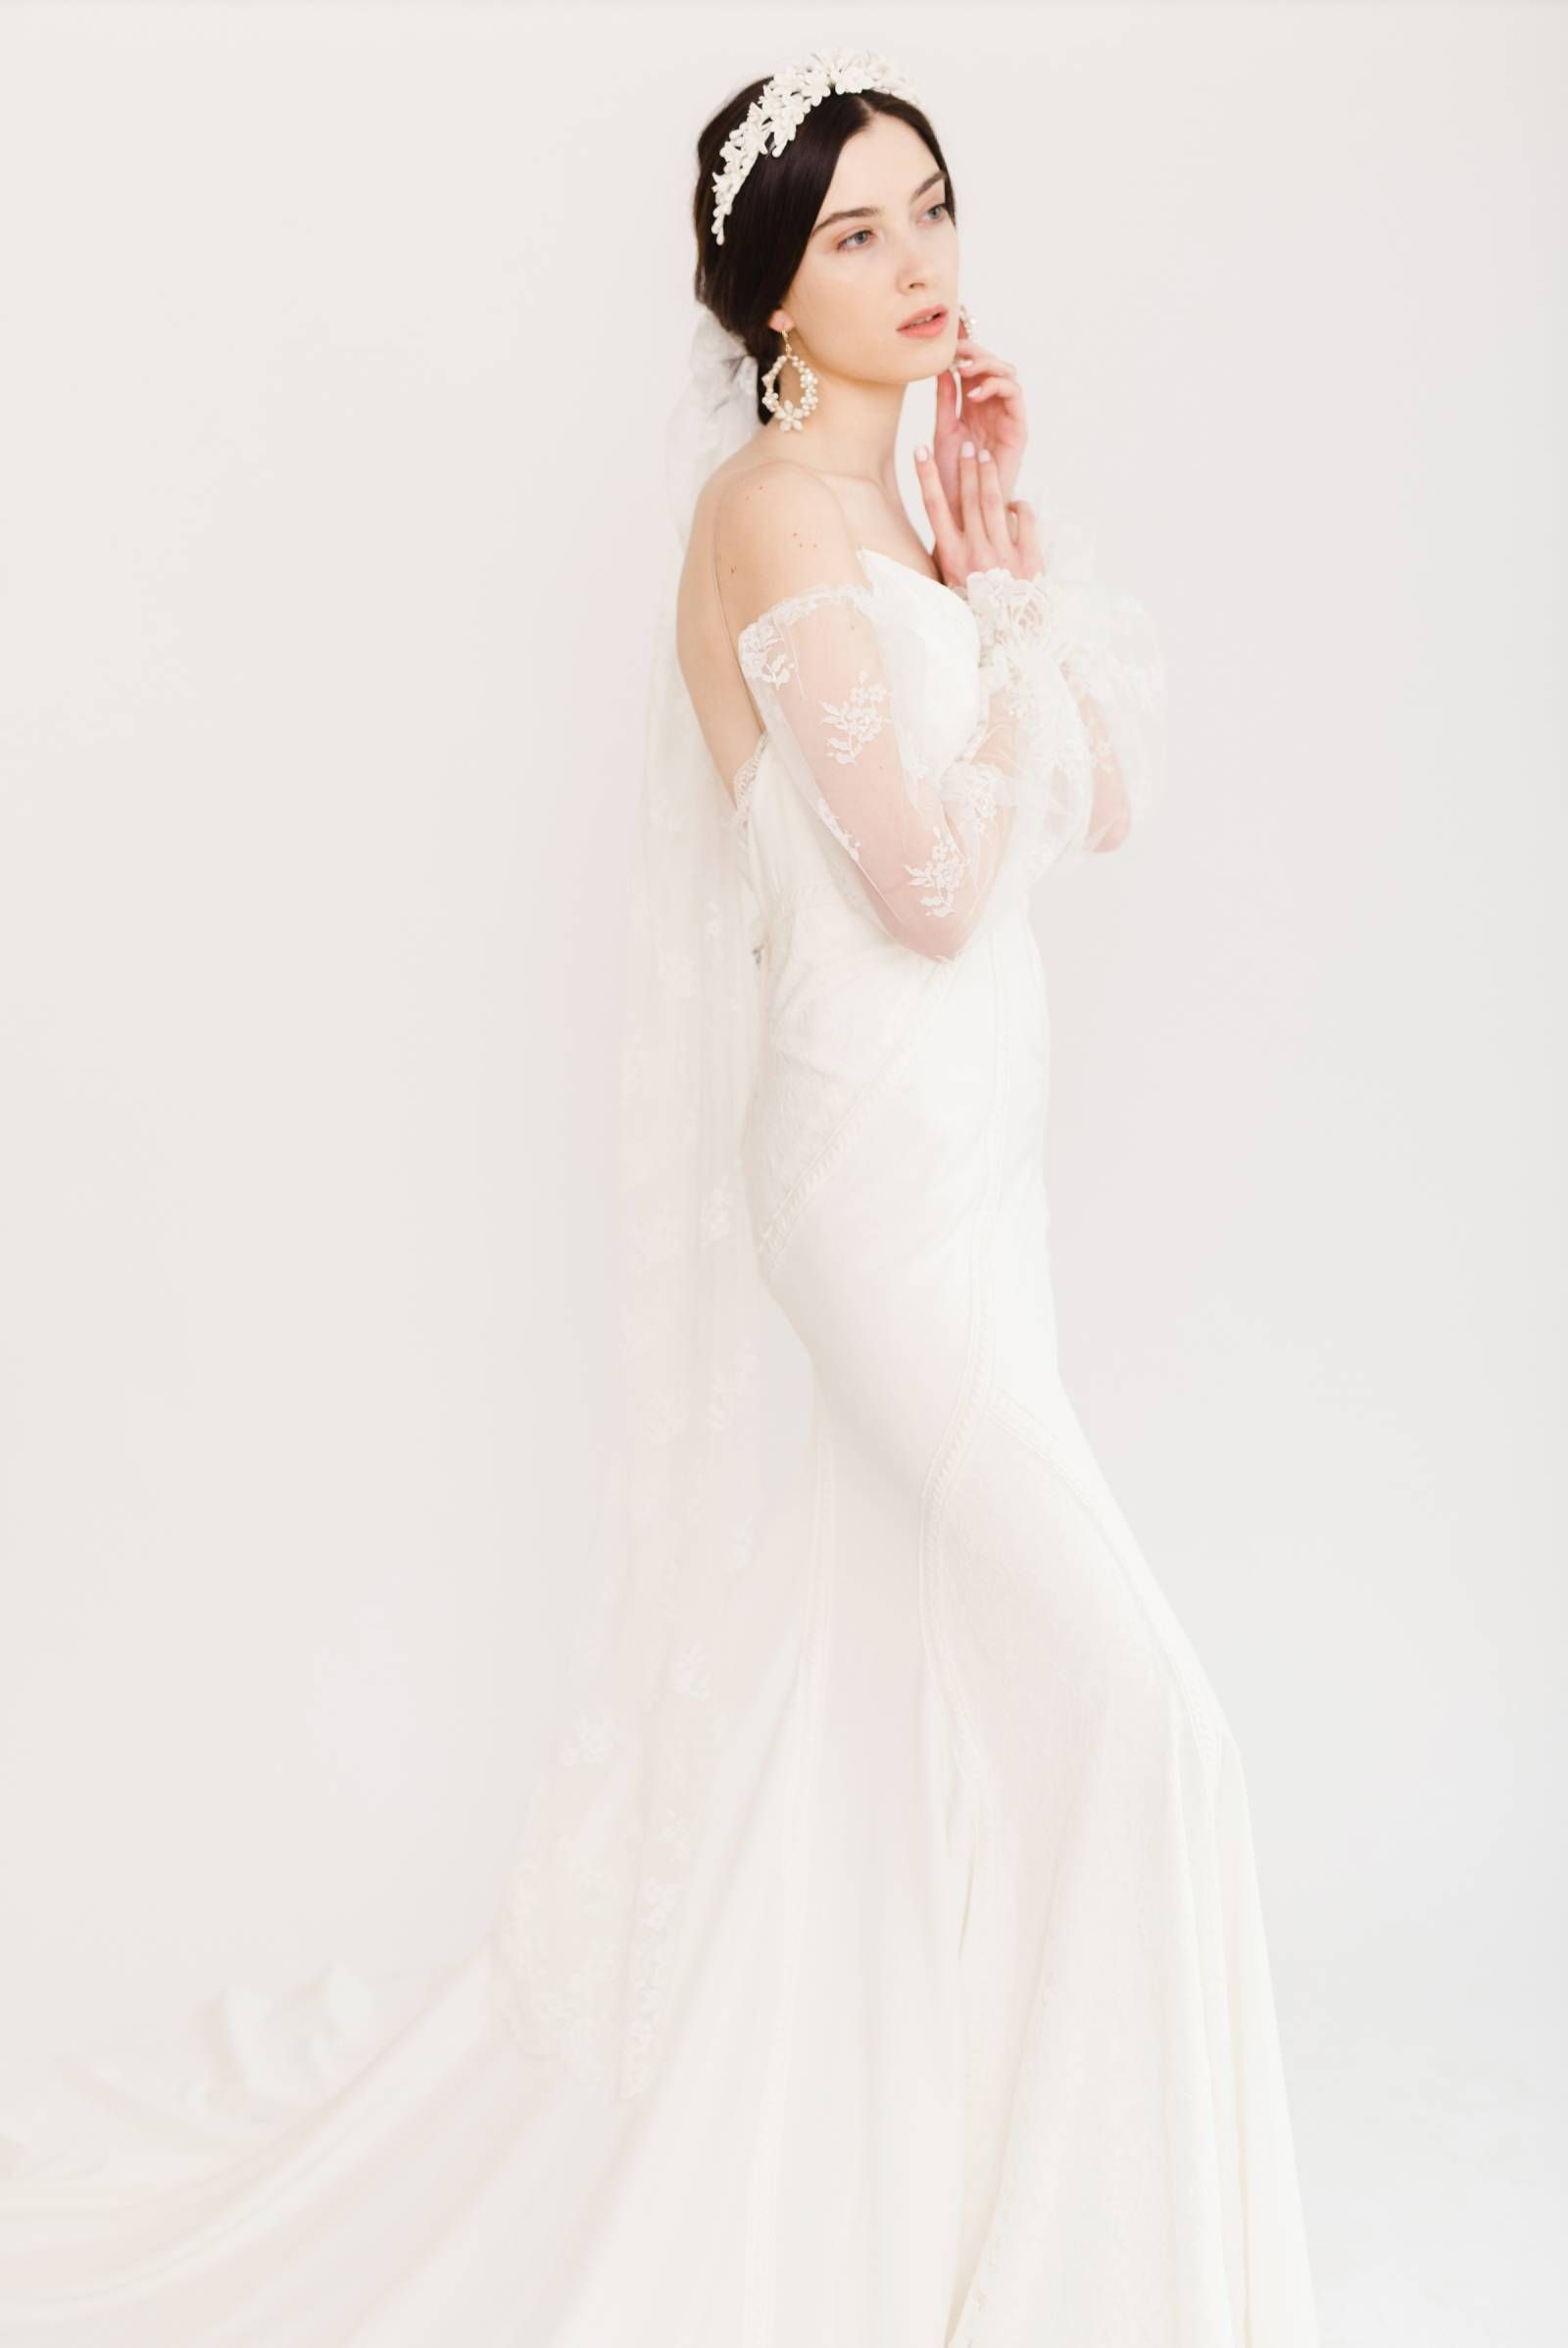 Minimalist Delicate Bridal Inspiration In Shades Of White Via Magnolia Rouge Bridal Inspiration Bridal Bridal Wear [ 2396 x 1600 Pixel ]